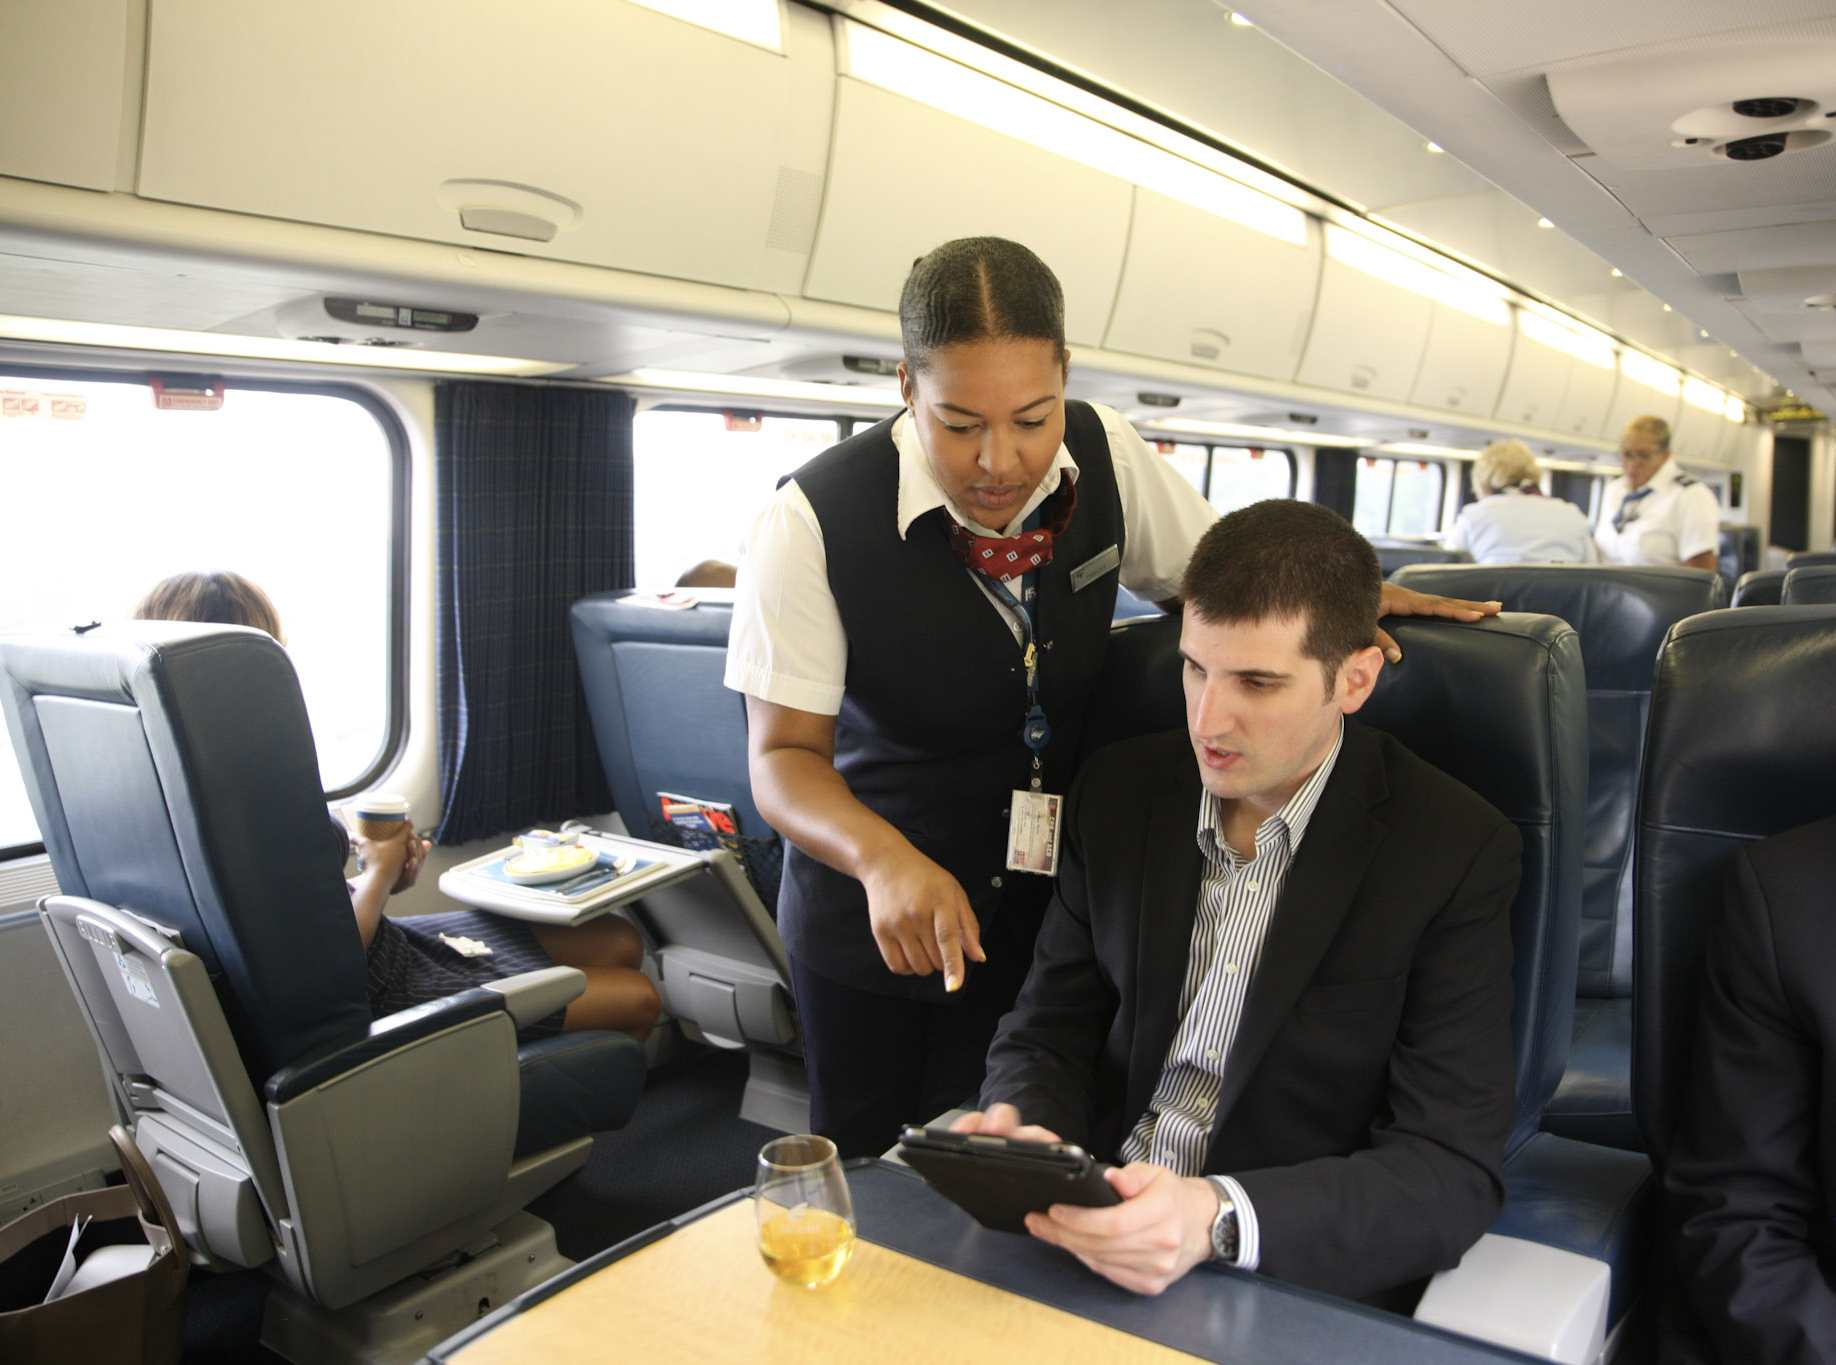 cela Express Route: Washington, D.C. – Boston